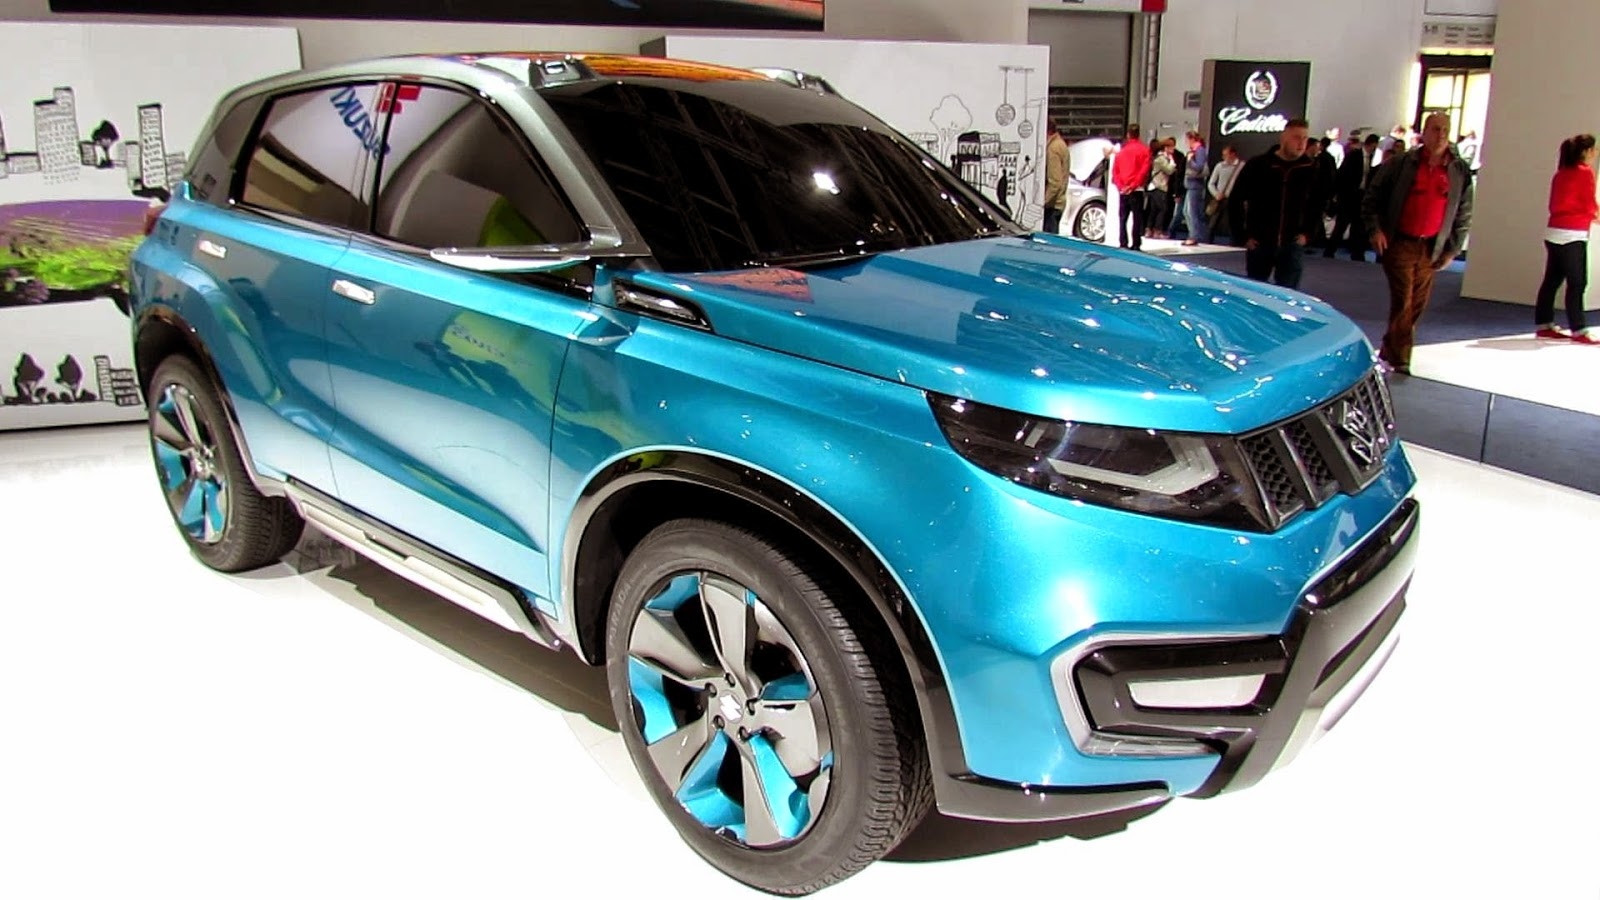 2015 suzuki grand vitara cars concept 2015 2016. Black Bedroom Furniture Sets. Home Design Ideas